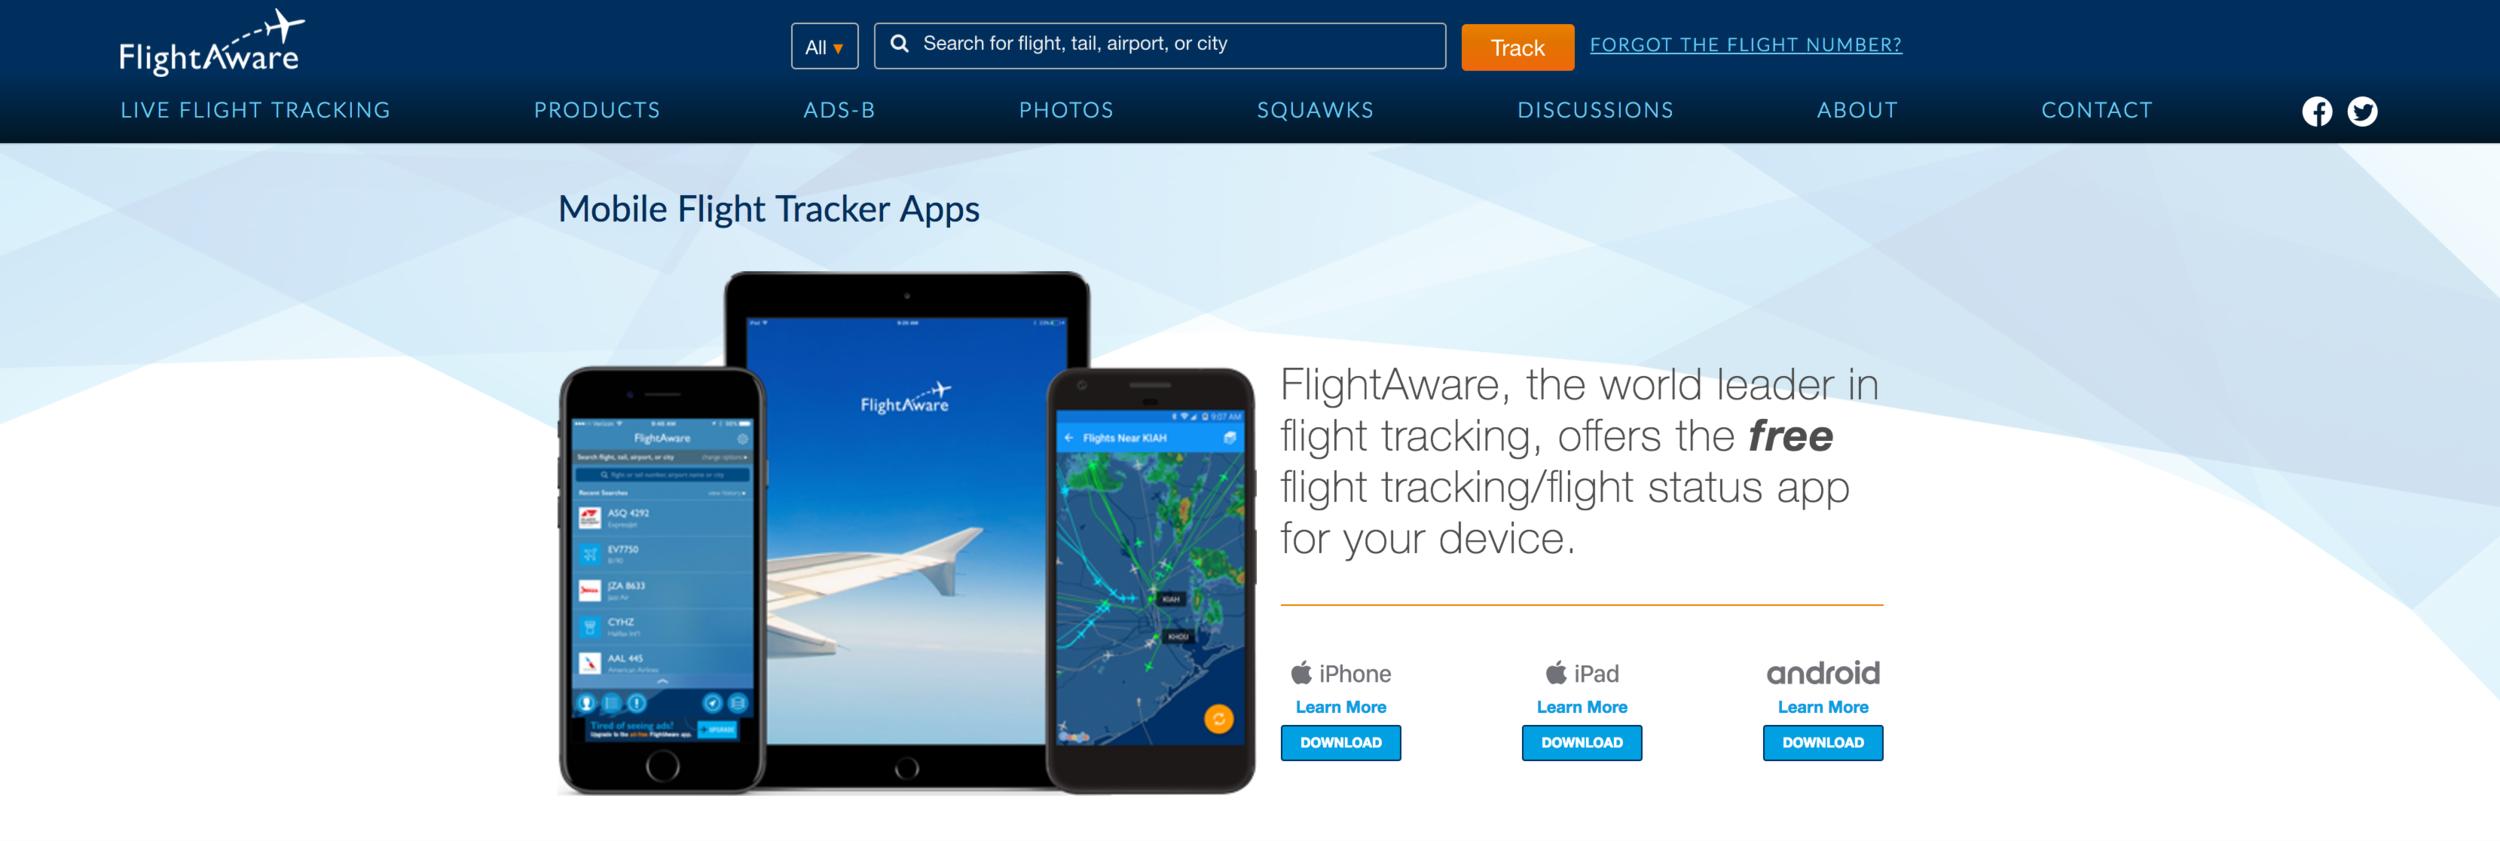 A screenshot of the FlightAware app in action.